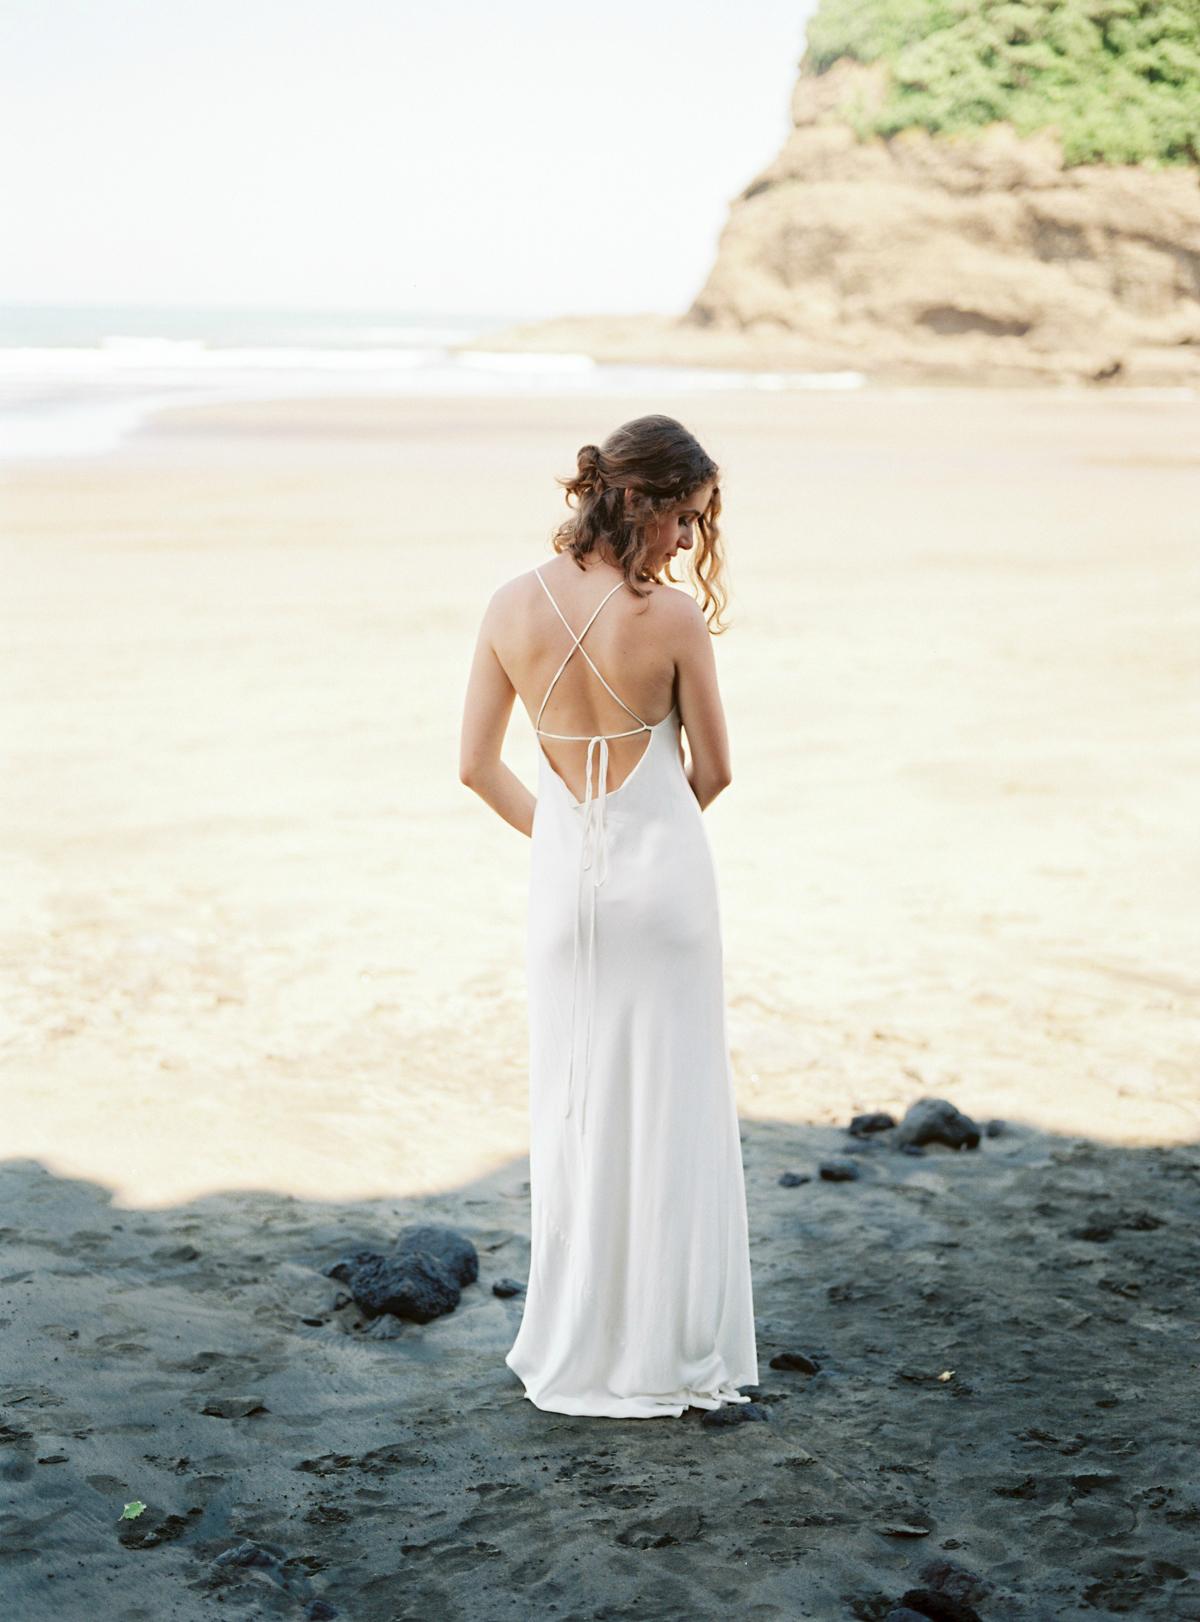 Bare back simple dress for beach wedding